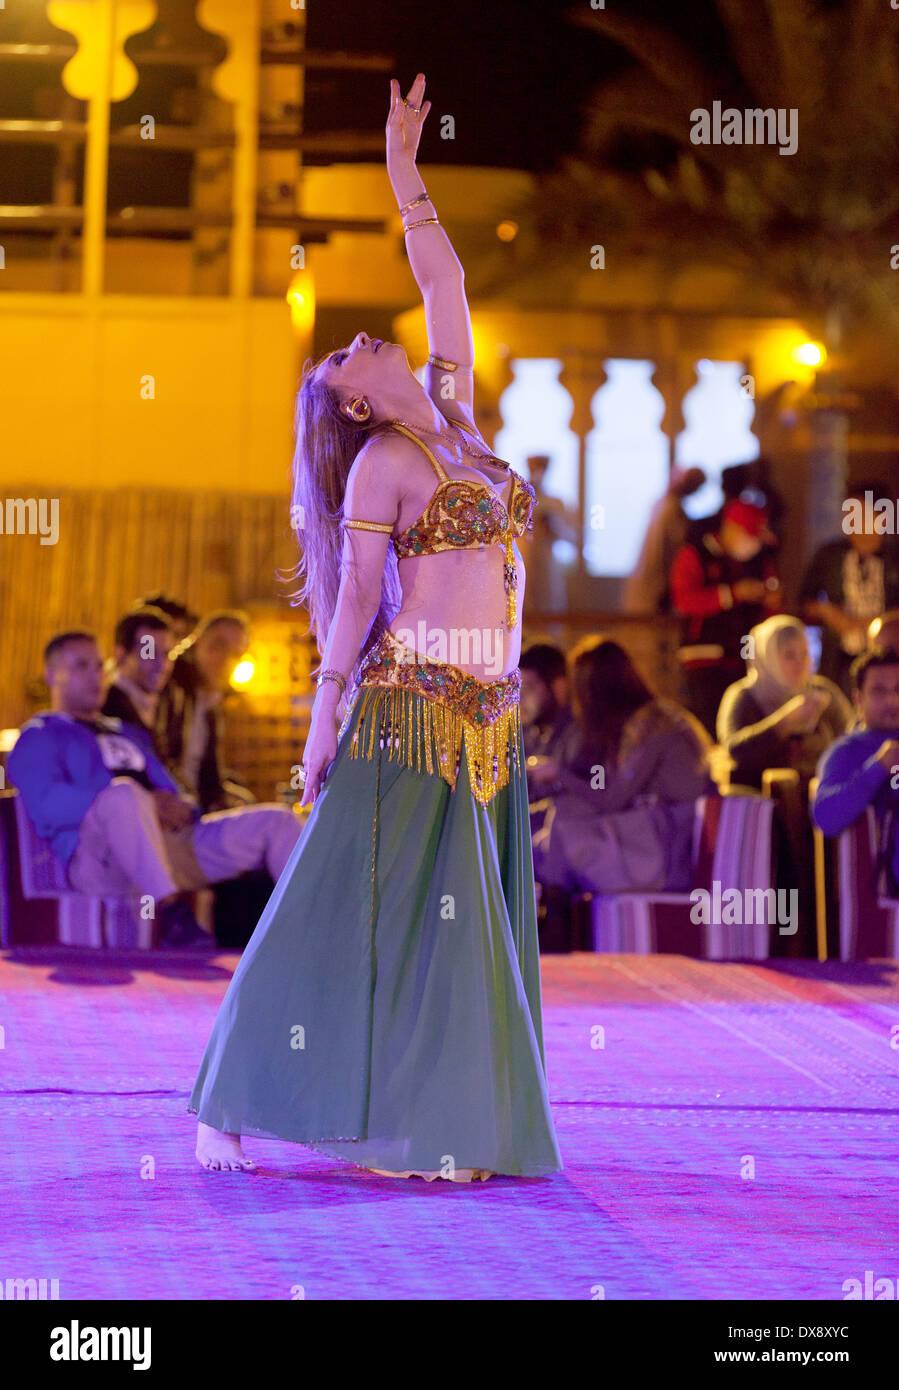 Belly Dancer Dubai Stock Photos Images Dancing Dance Desert Safari